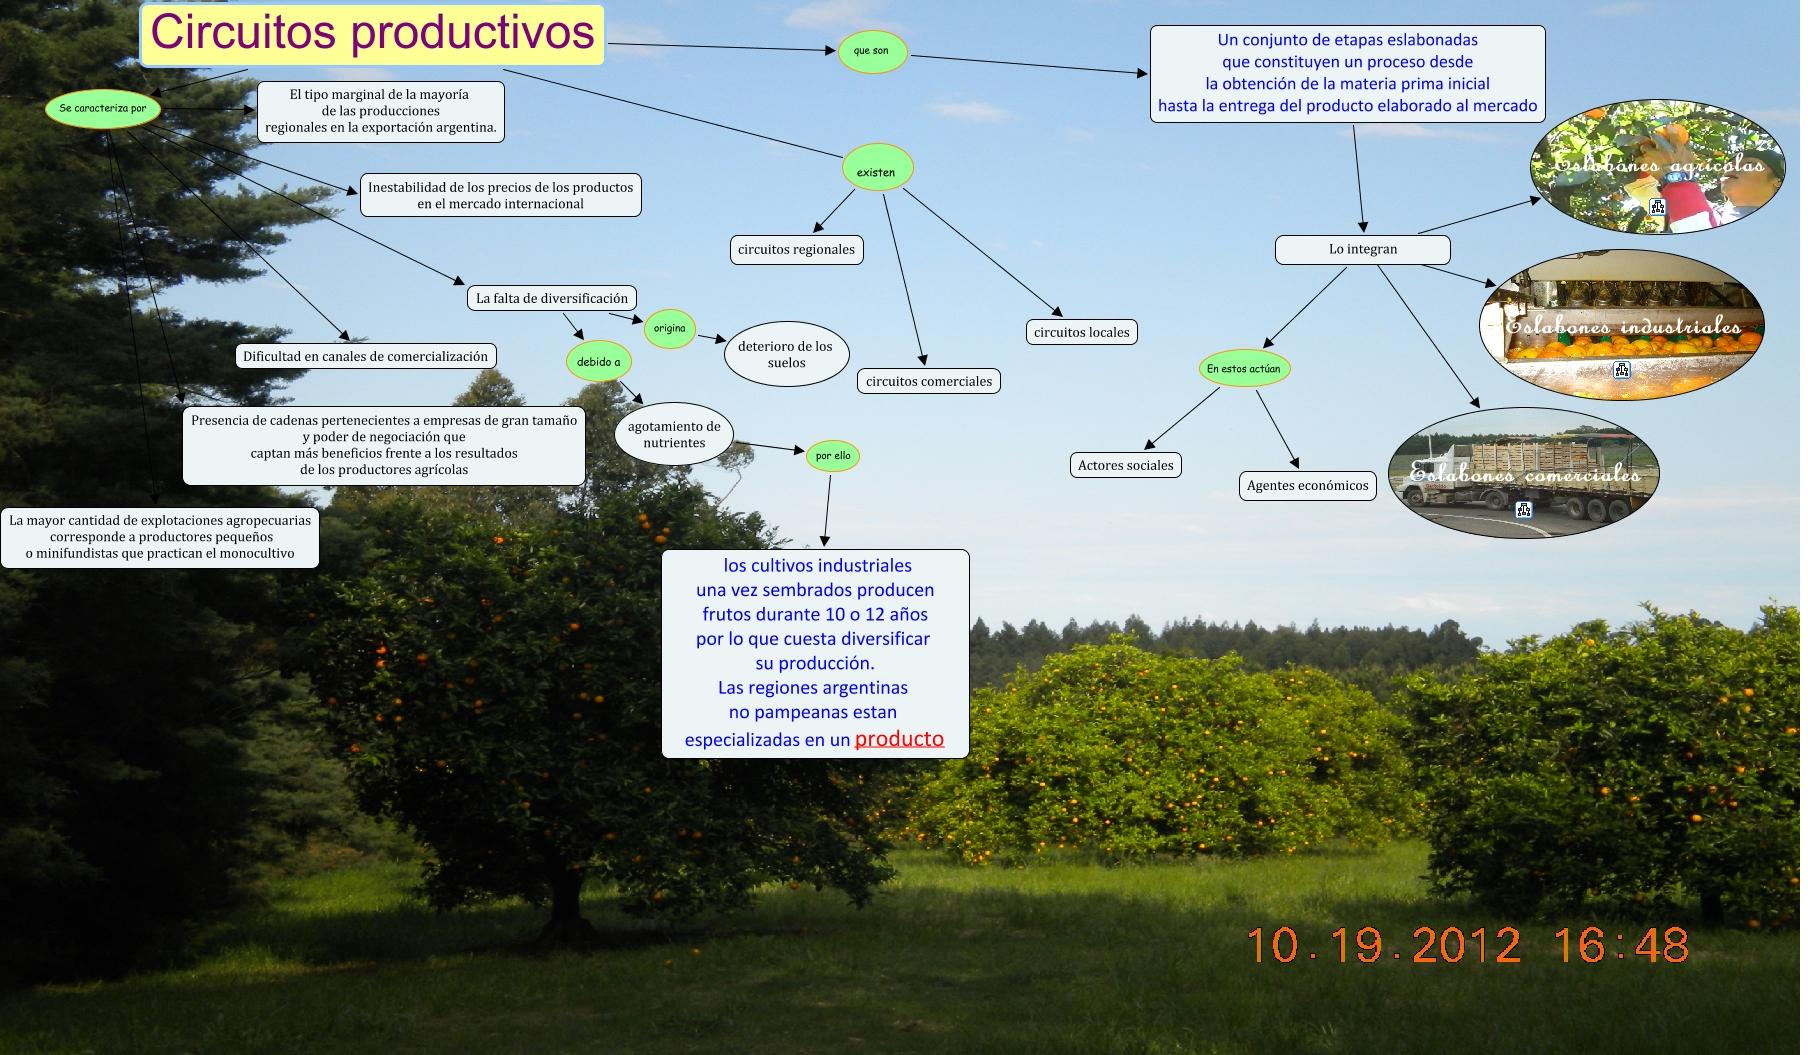 Circuito Yerba Mate : Circuito productivo